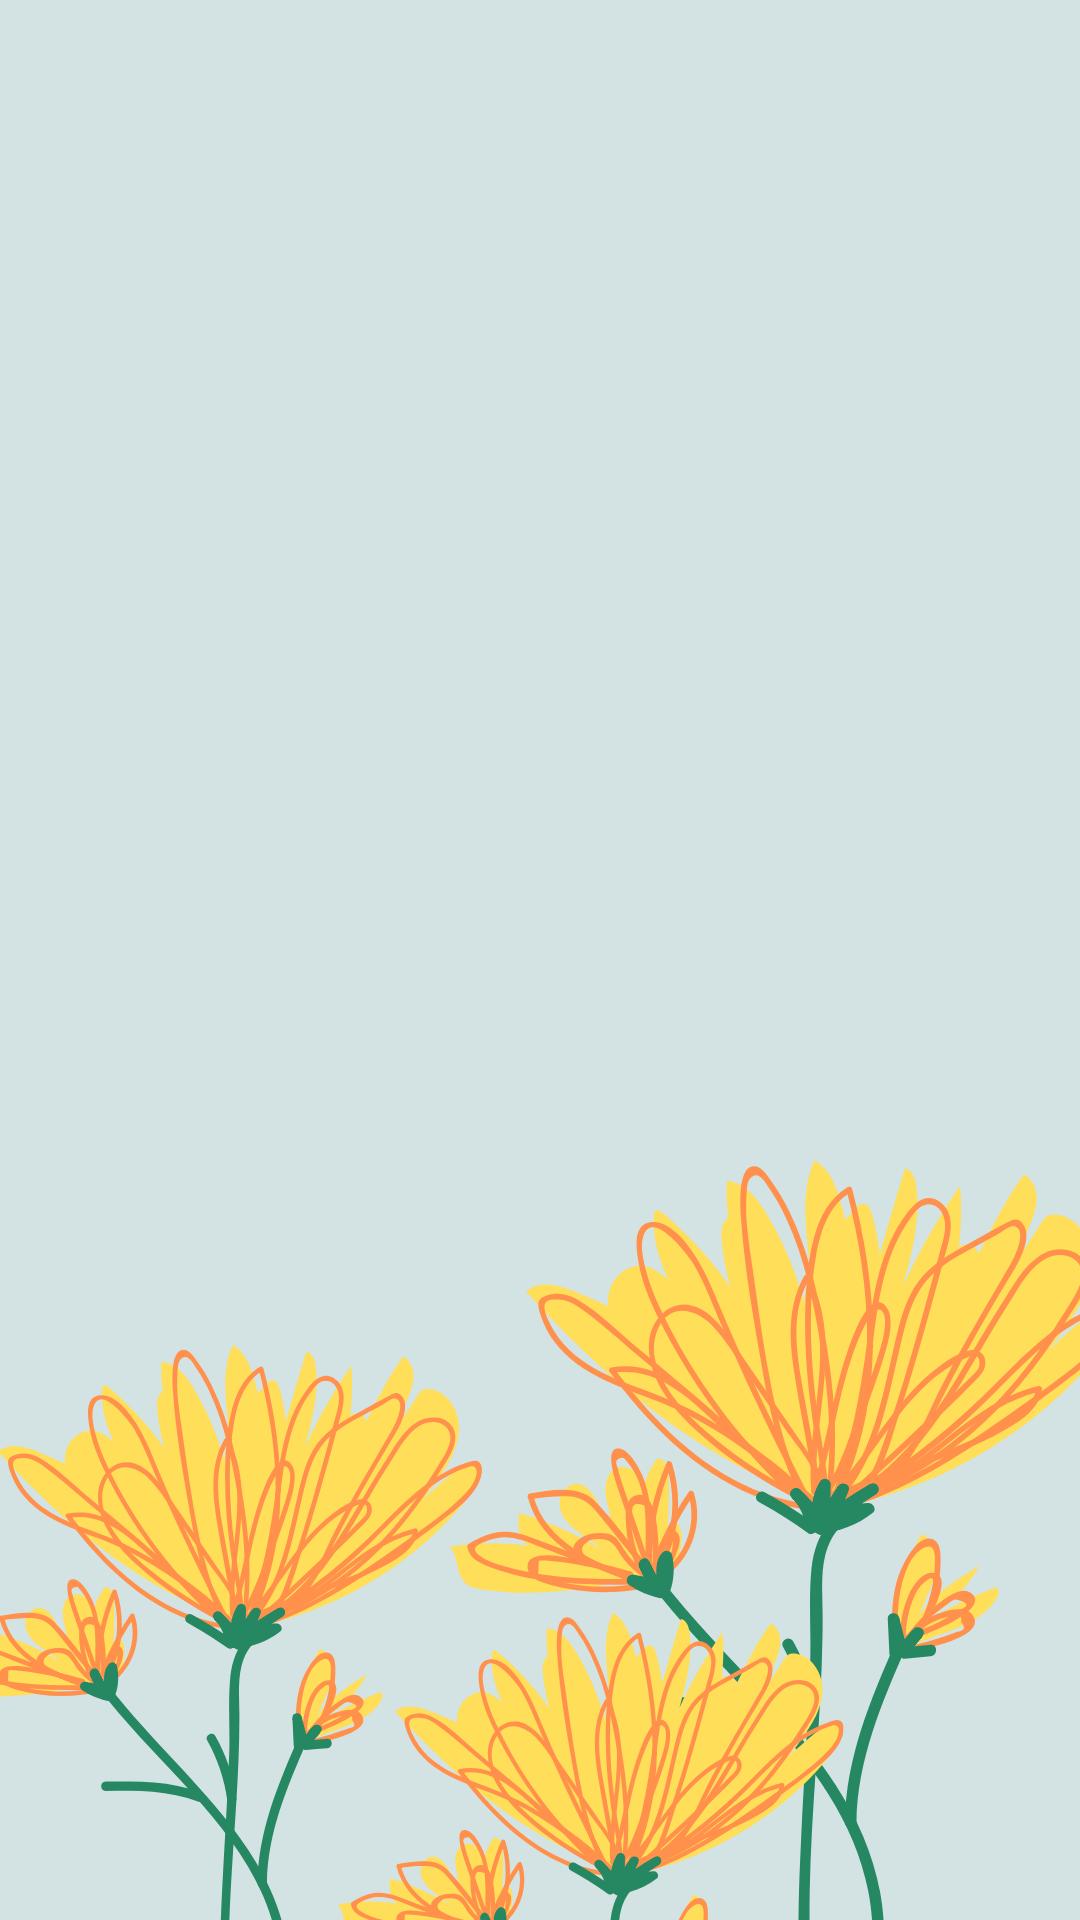 Spring Phone Wallpapers Flower phone wallpaper Phone wallpaper 1080x1920